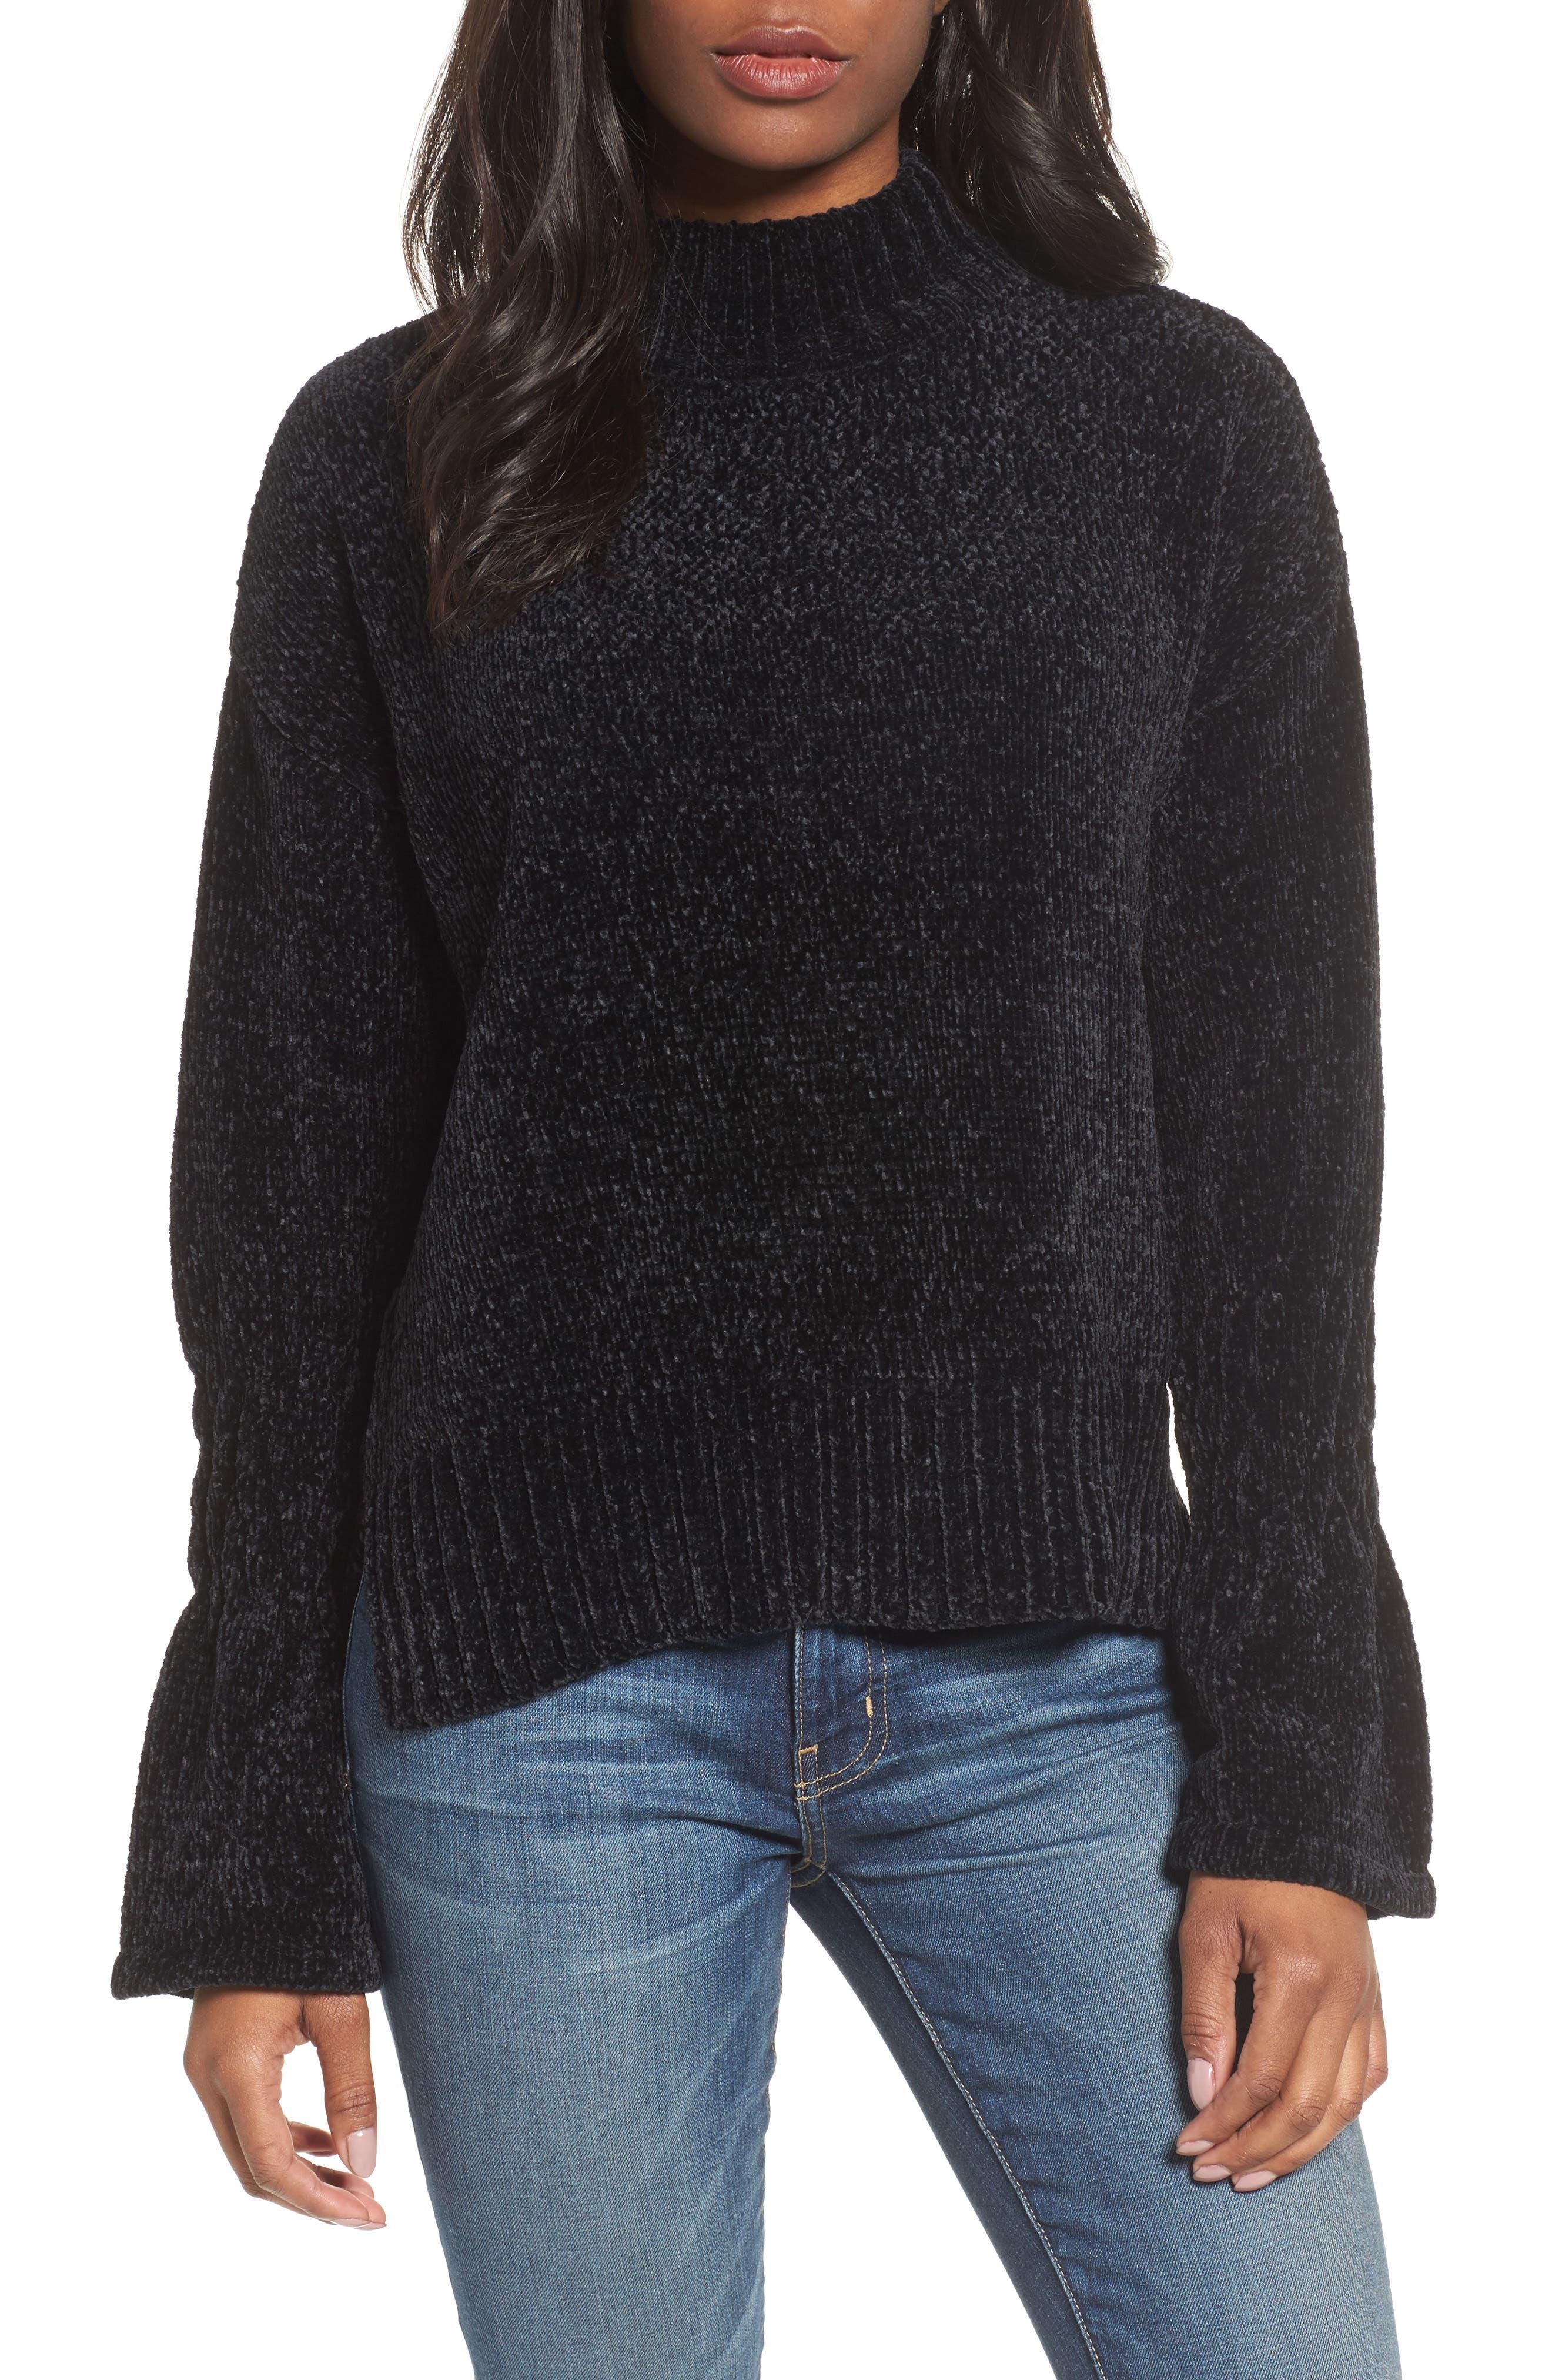 Bell Cuff Sweater,                         Main,                         color, Black